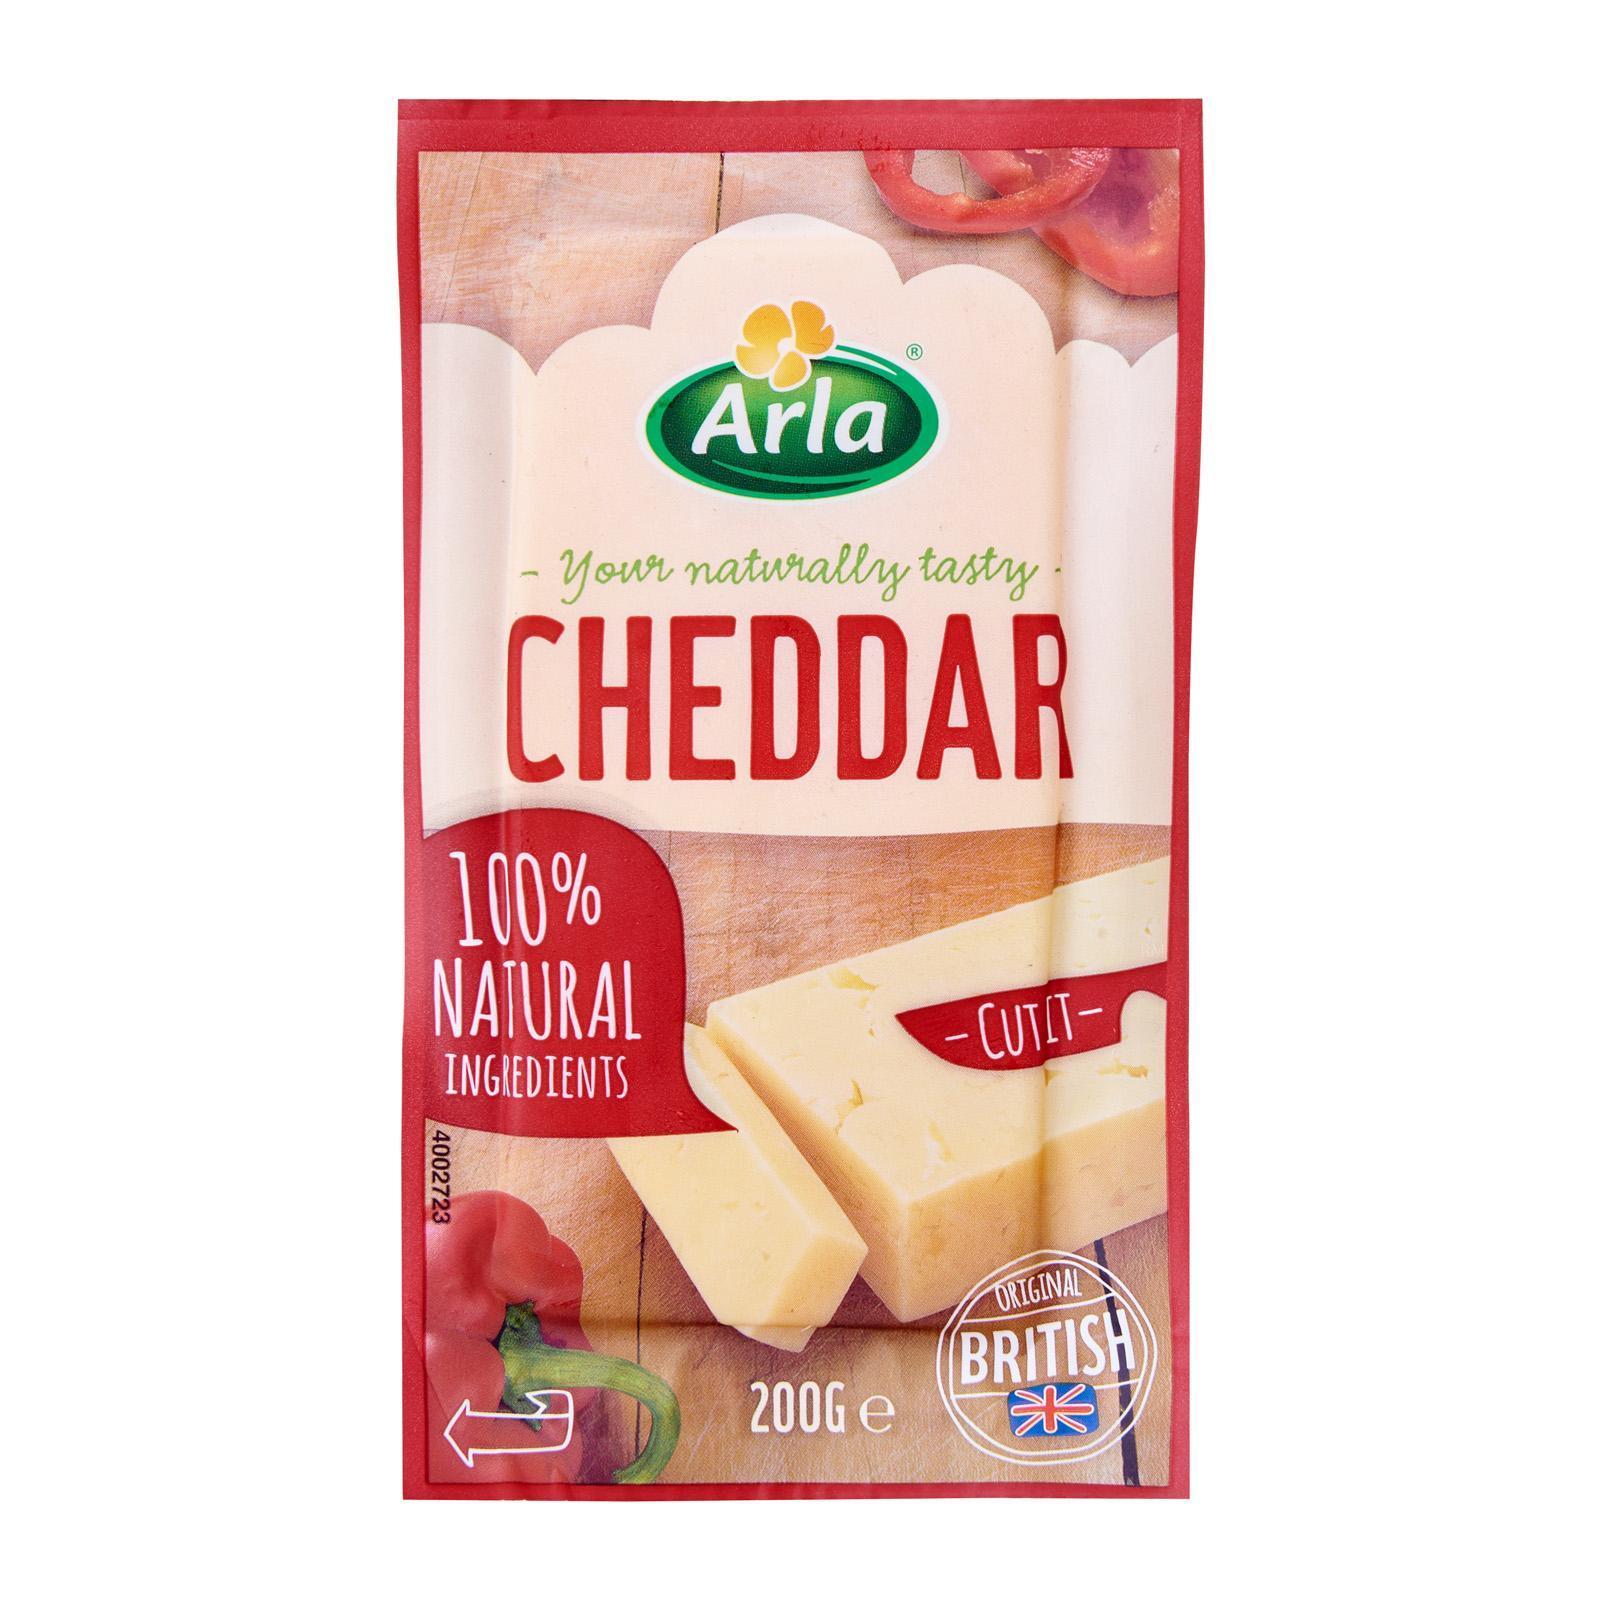 Arla Cheddar Block Cheese